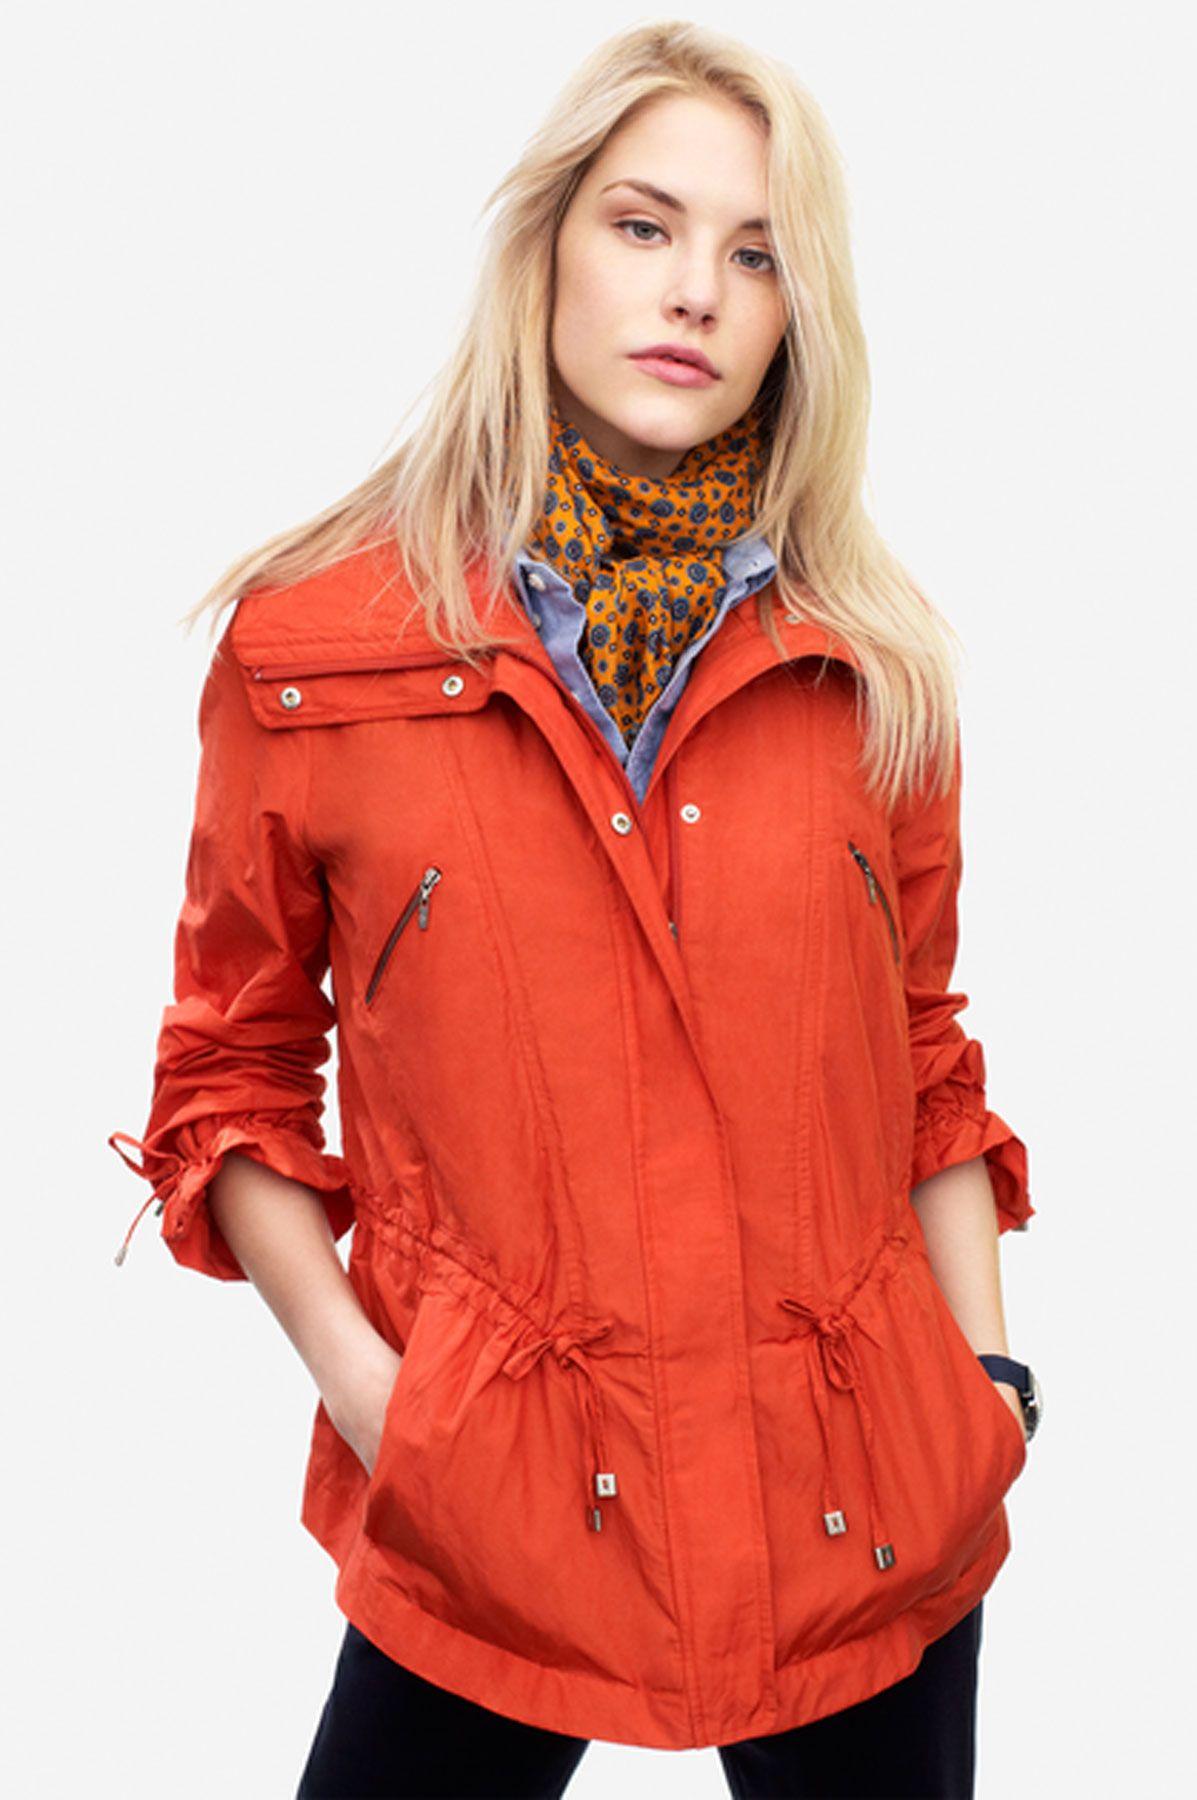 13 Raincoats Thatll Make You Feel Pretty Even When the Weather Stinks 13 Raincoats Thatll Make You Feel Pretty Even When the Weather Stinks new pictures